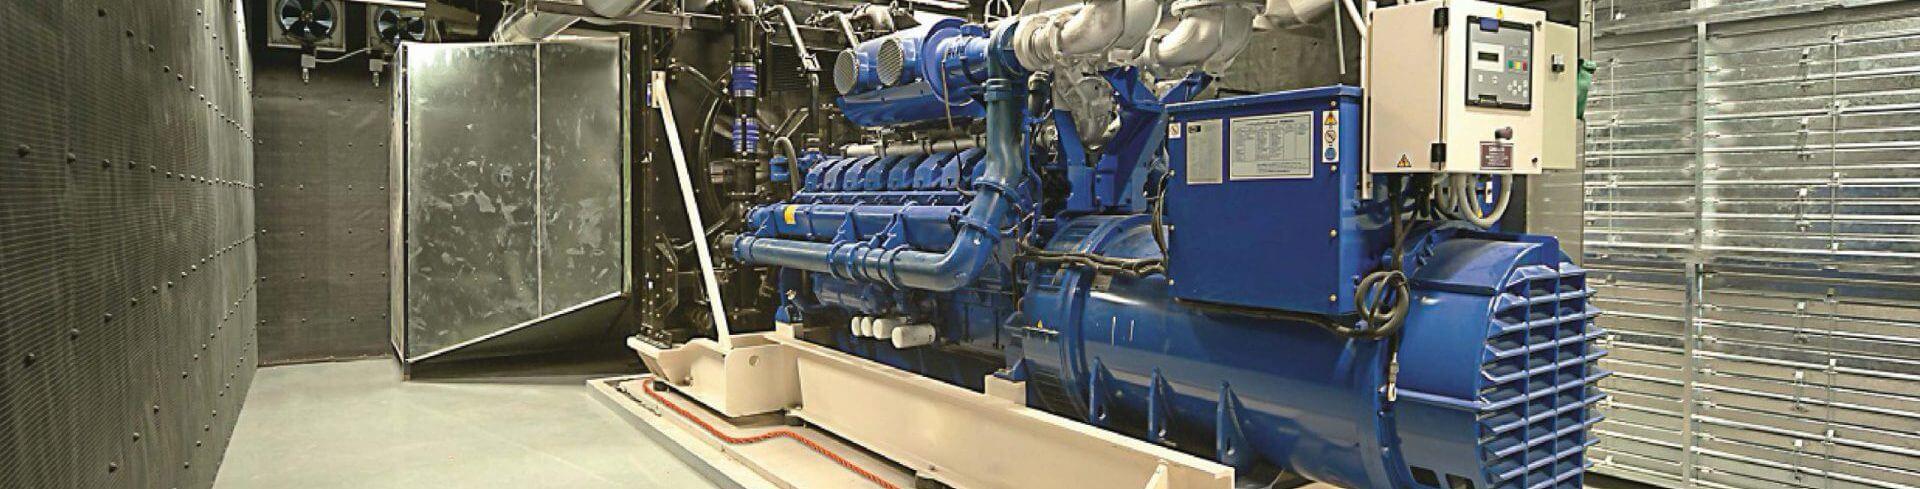 TTK diesel oil leak detection solutions for generators